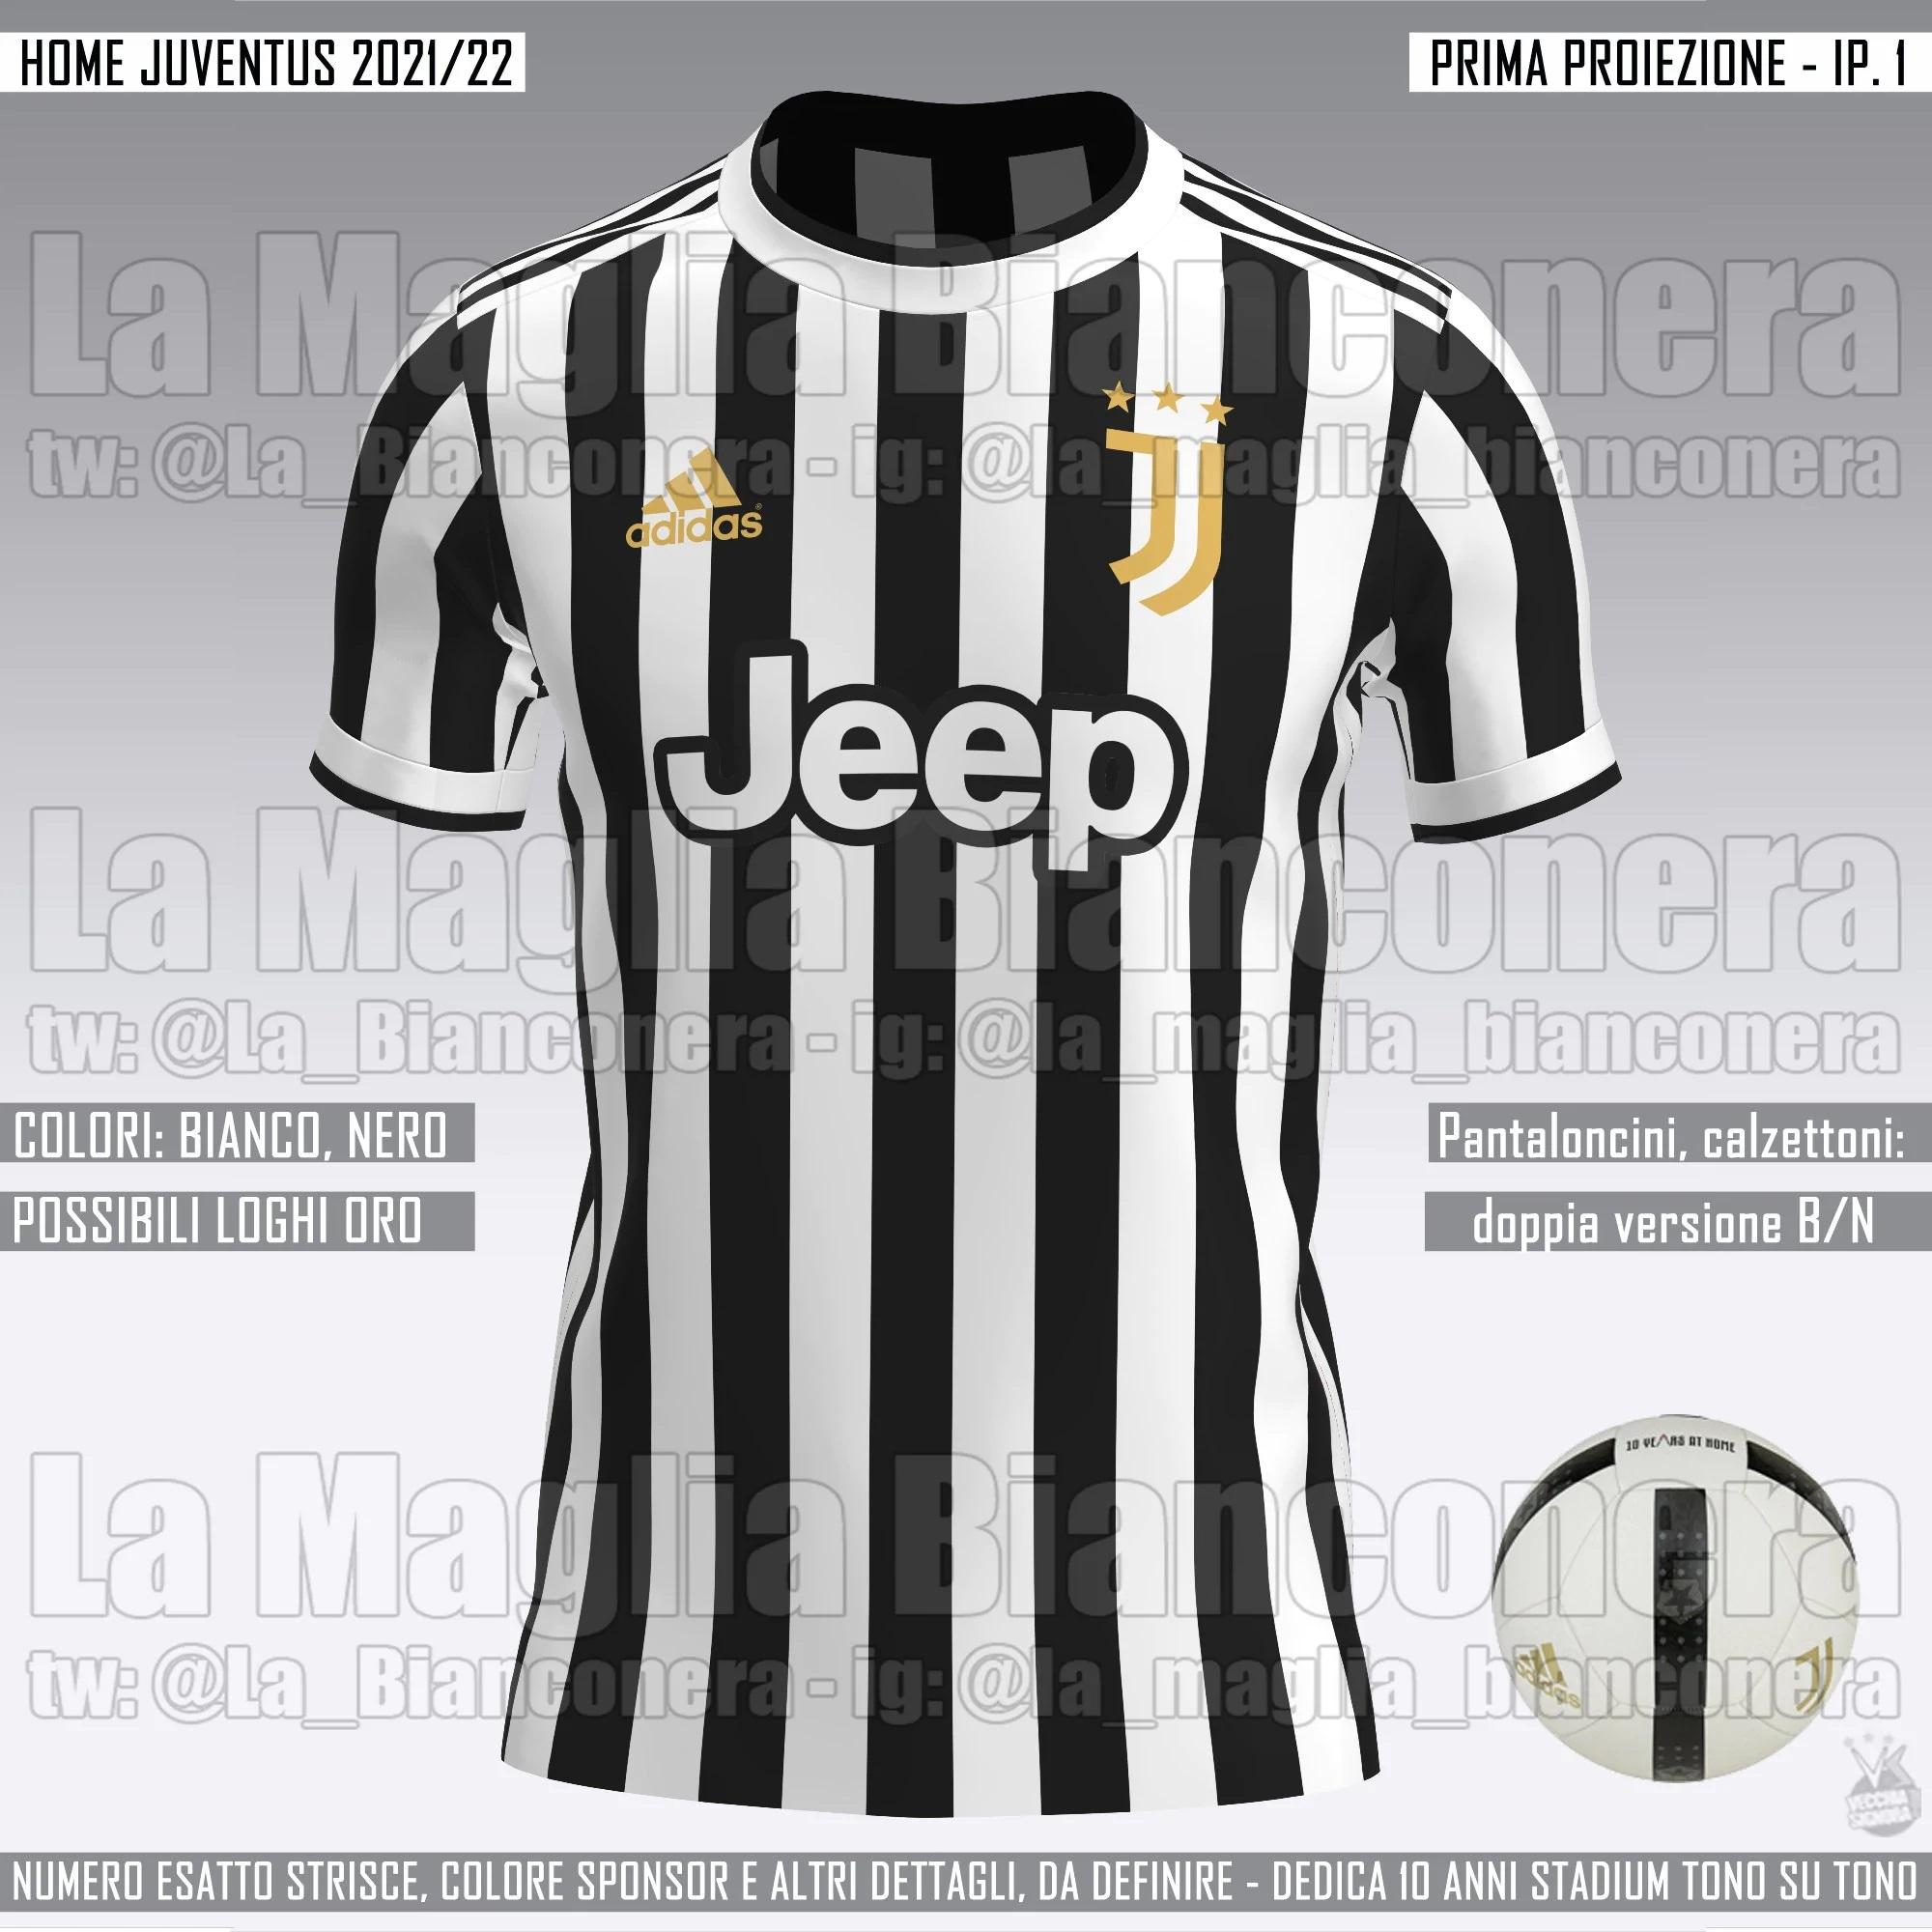 maillot Juventus 2021 2022 | Juventus fr.comJuventus fr.com